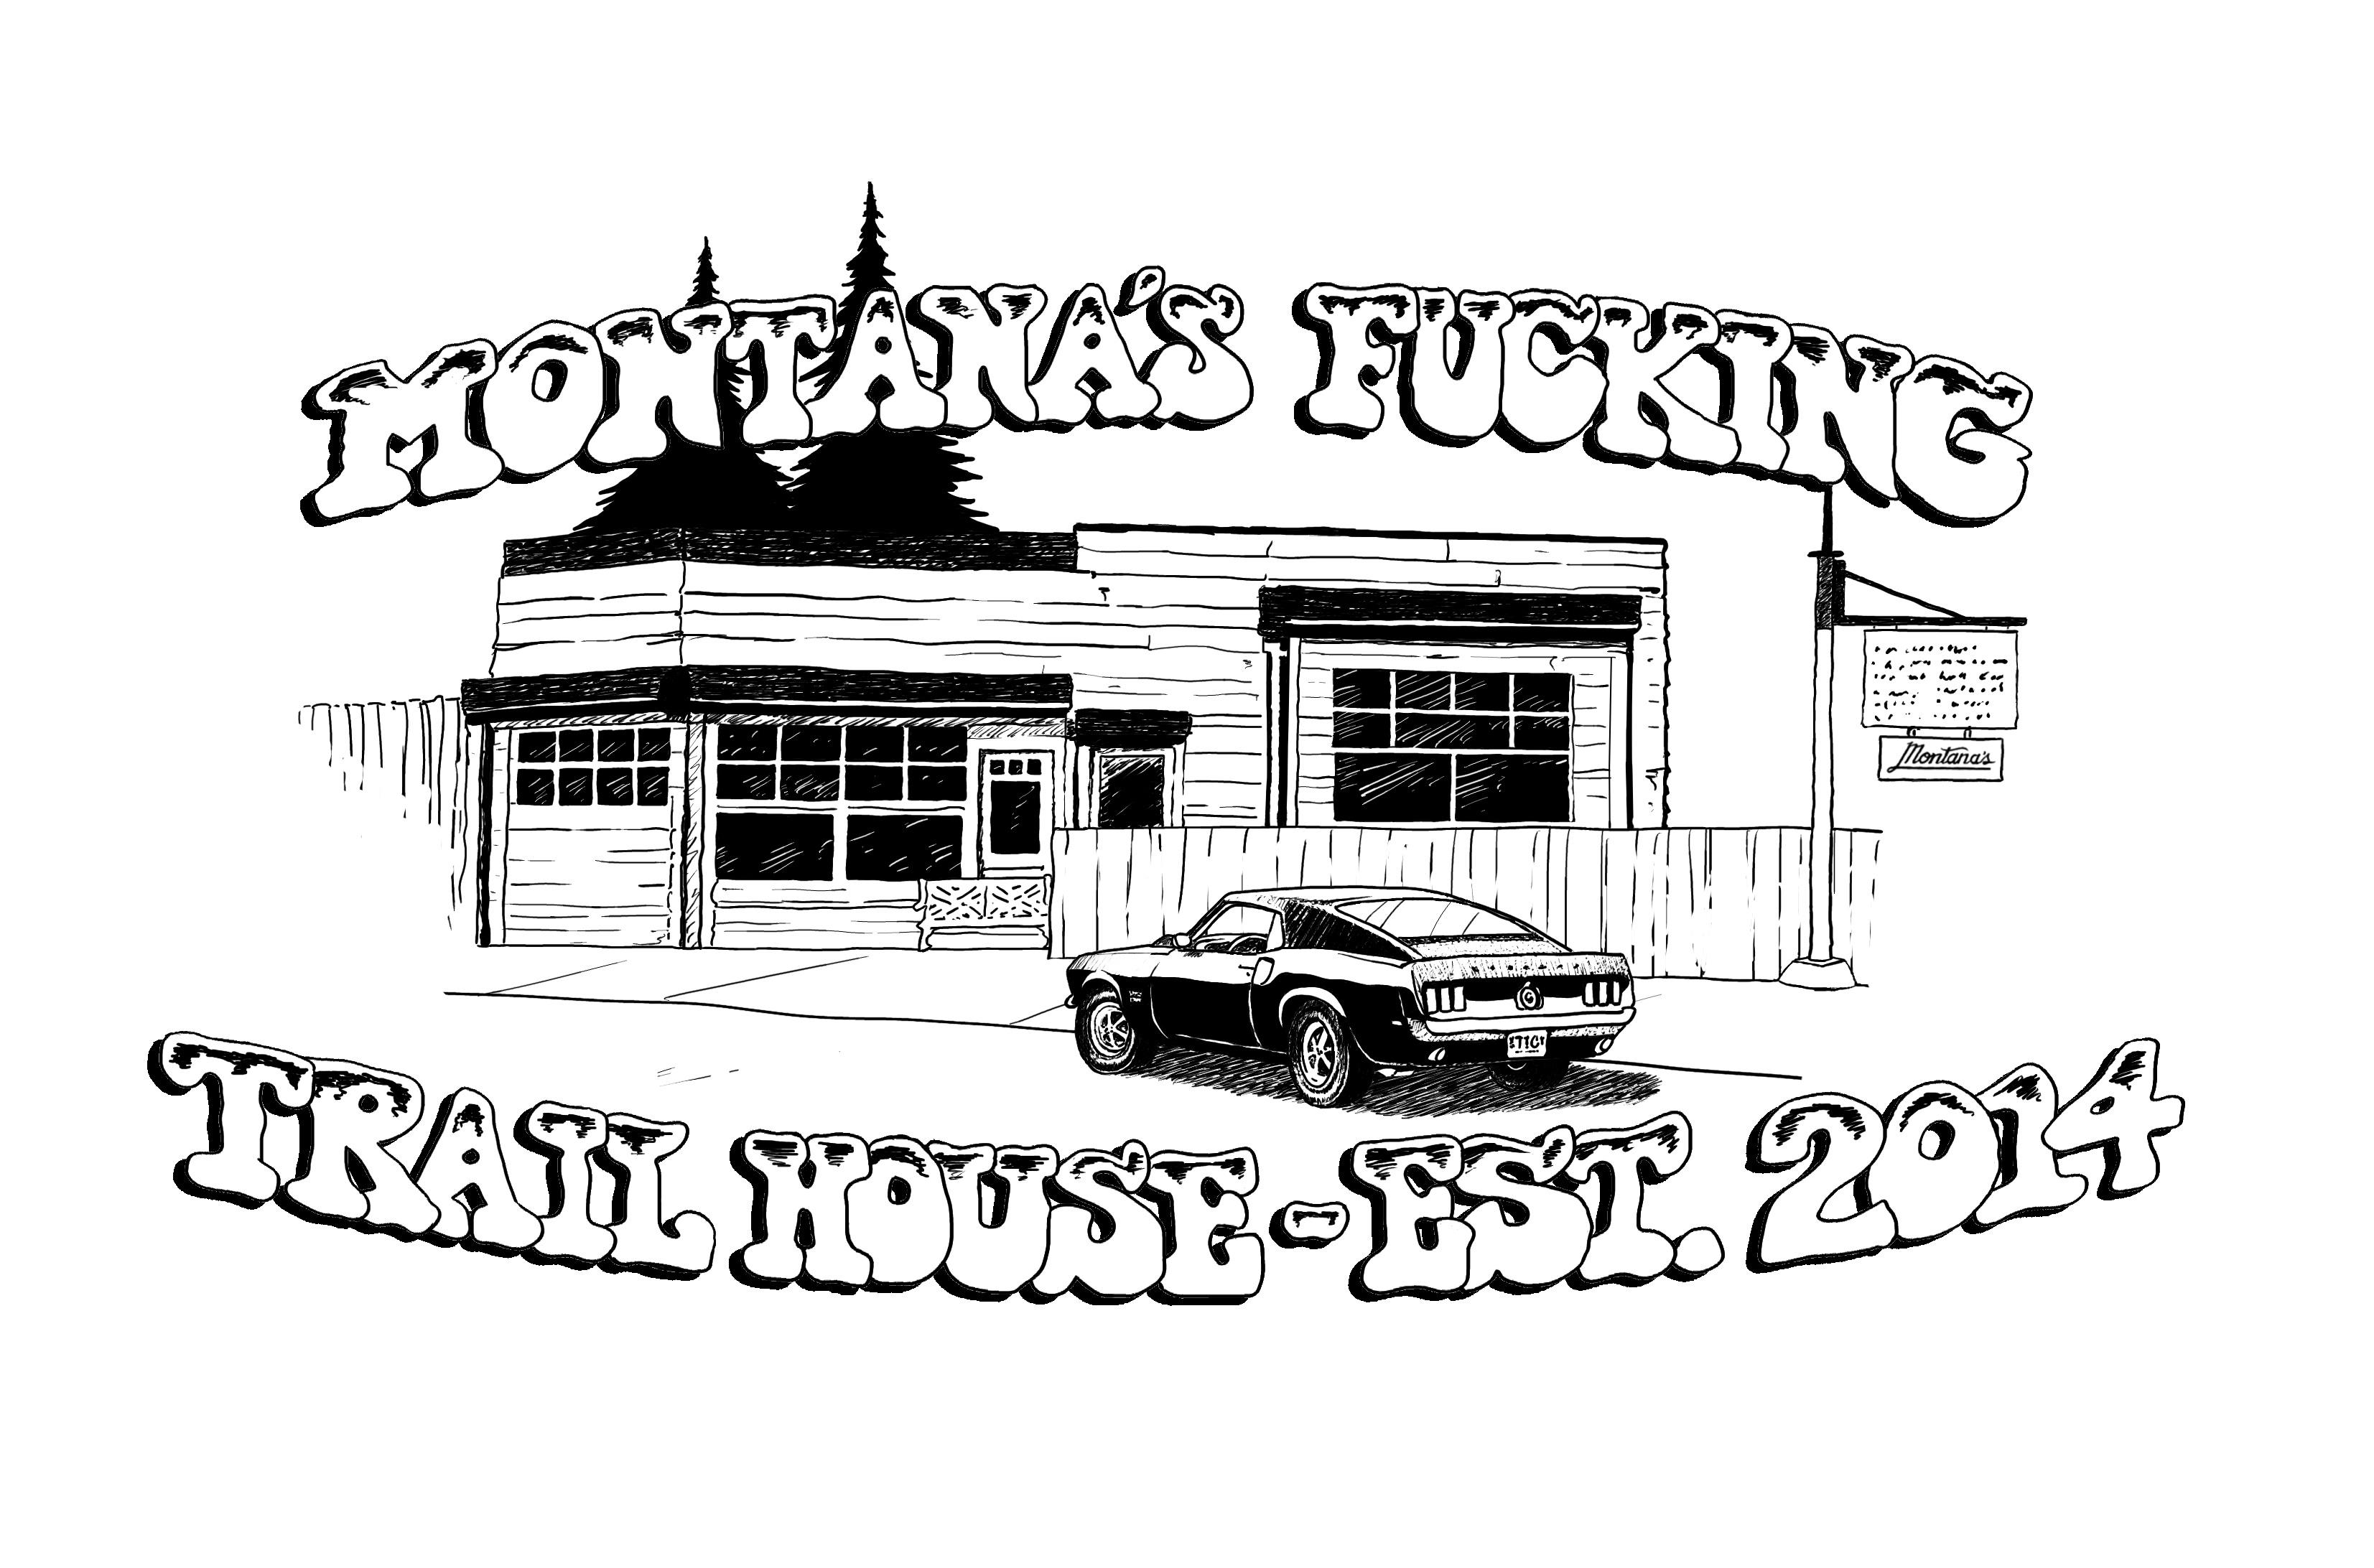 Montana's_Final